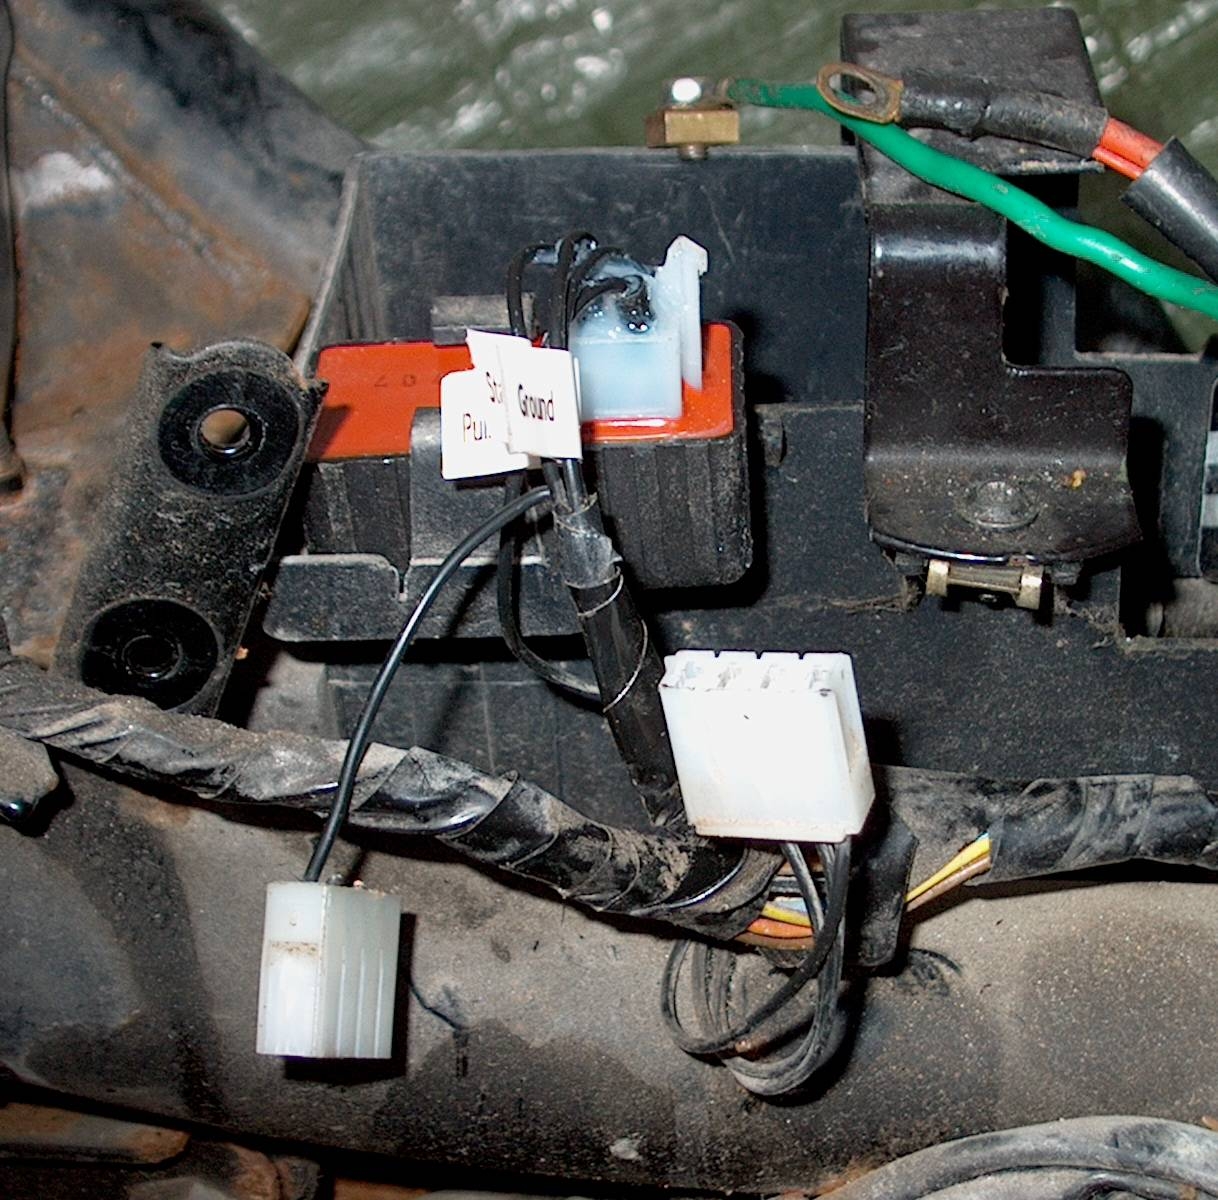 peugeot wiring diagram key peugeot image wiring peugeot trekker 50 wiring diagram peugeot discover your wiring on peugeot wiring diagram key